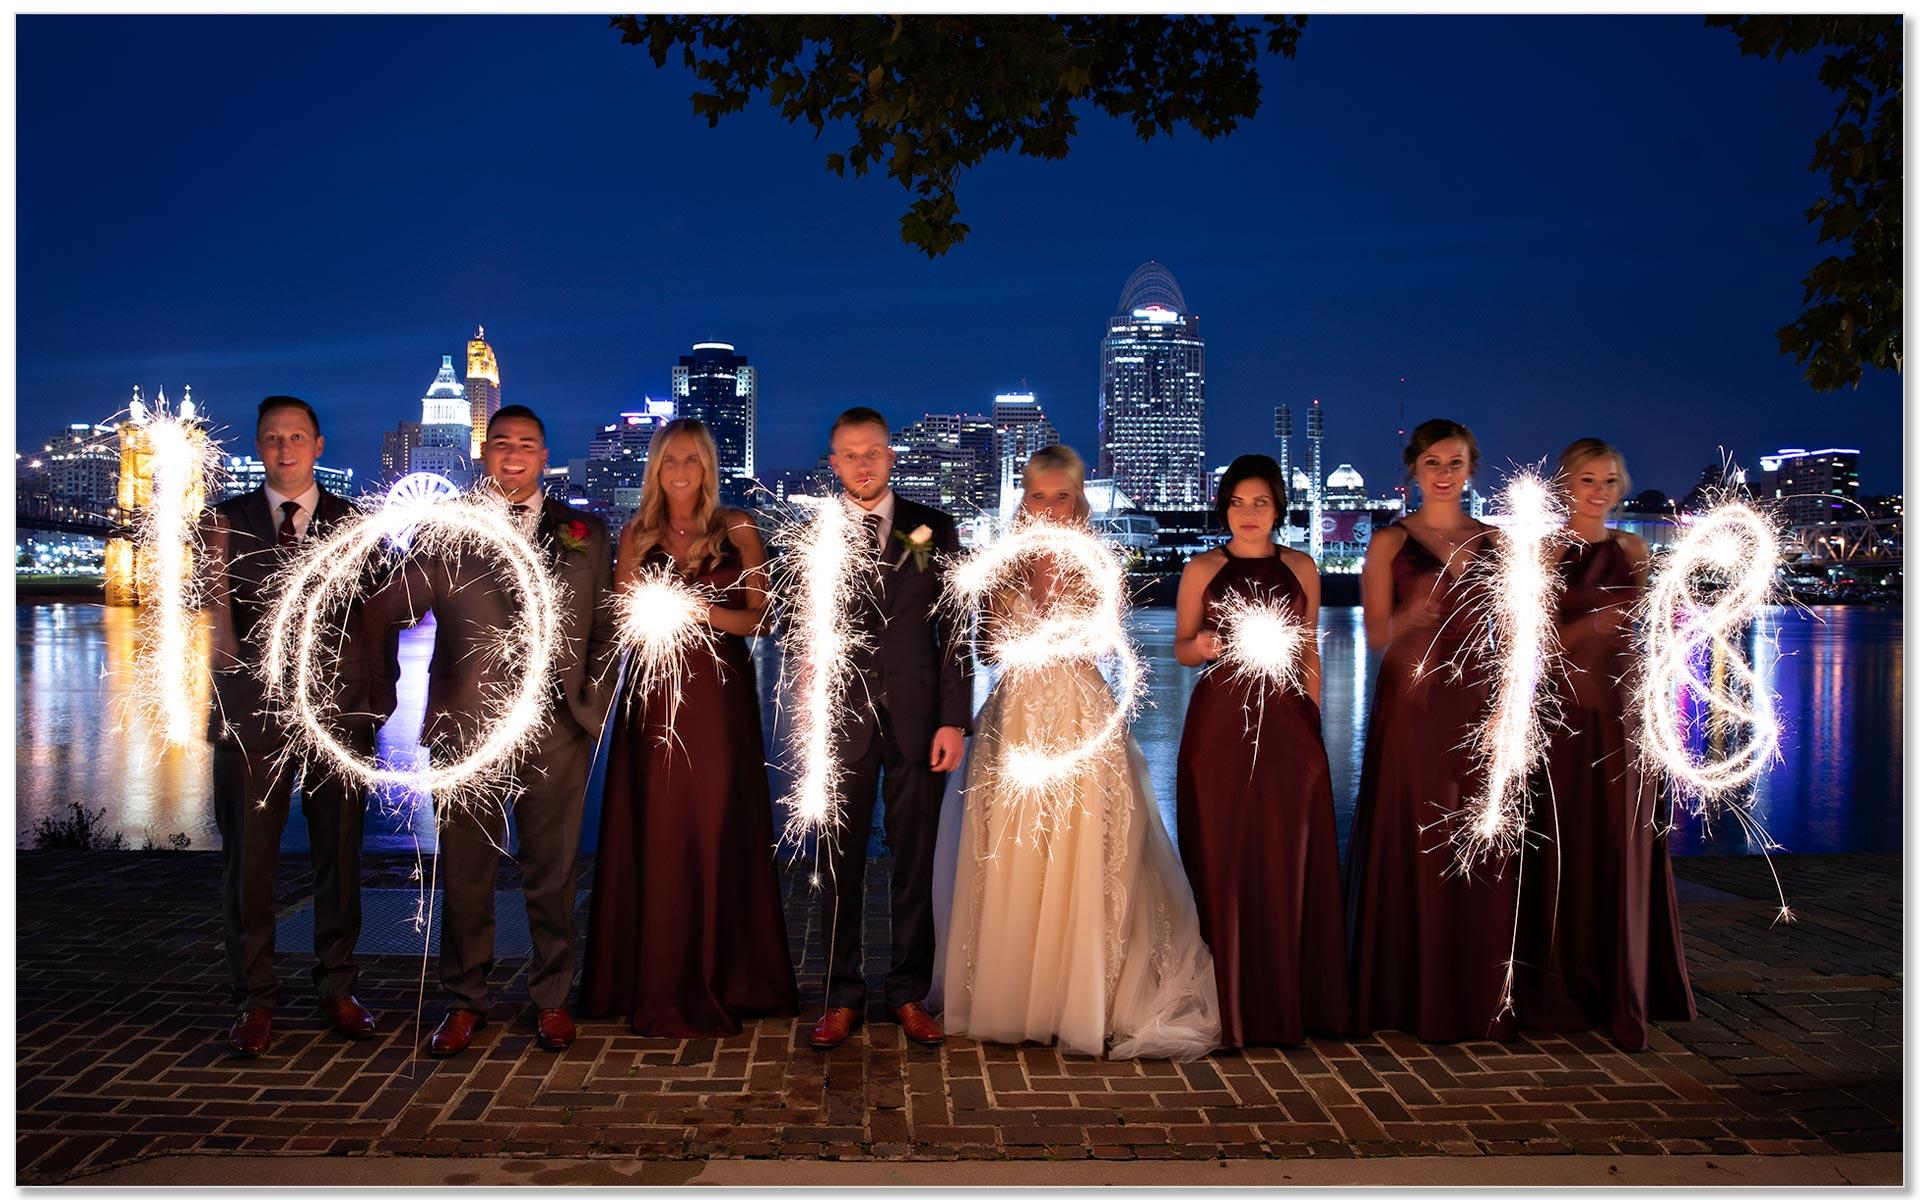 Cincinnati Mother of god wedding skyline sparklers